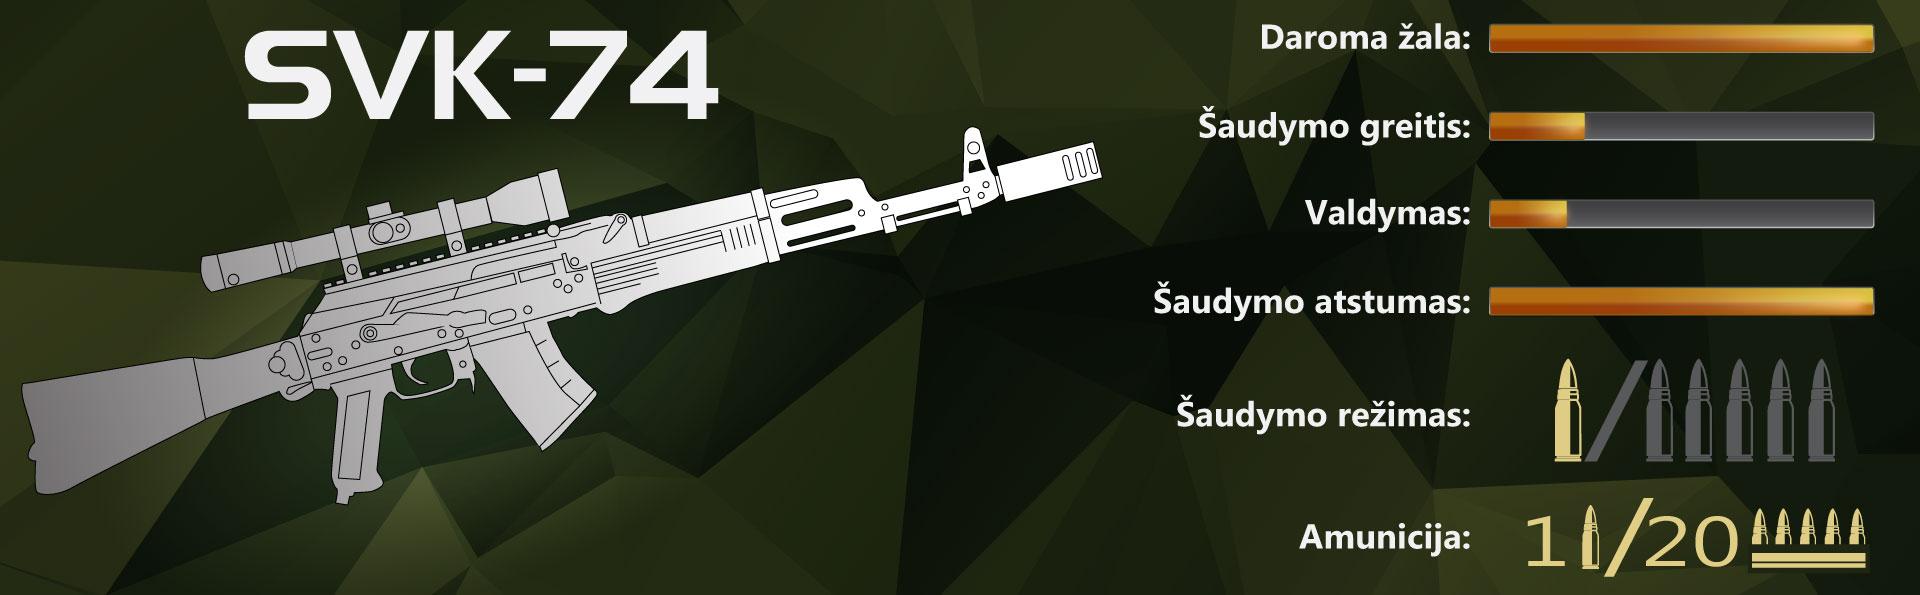 SVK - 74